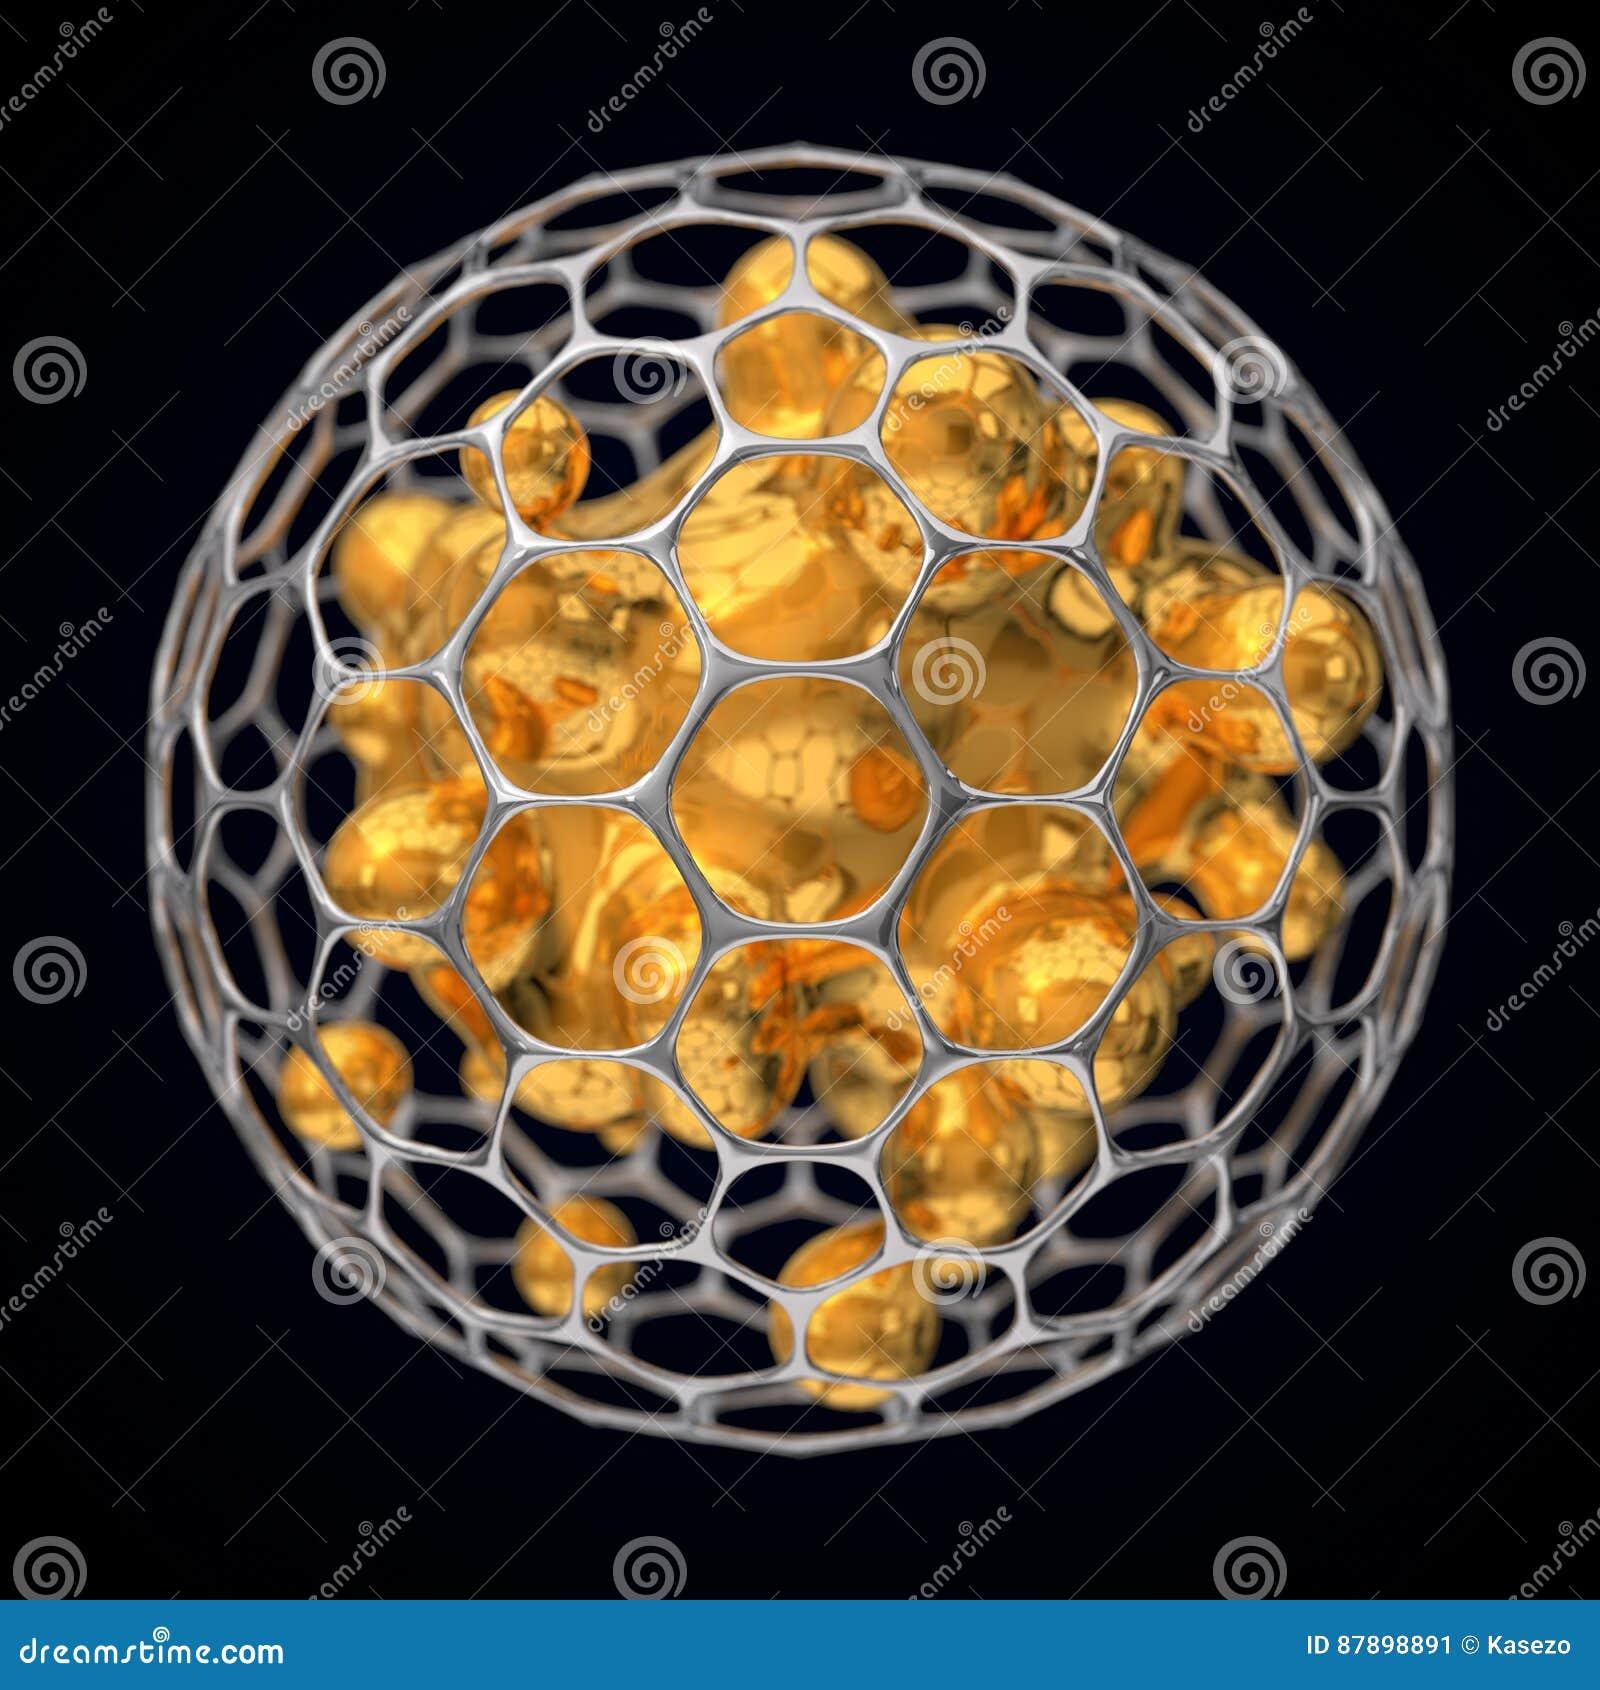 3d illustration of spherical graphene structure.